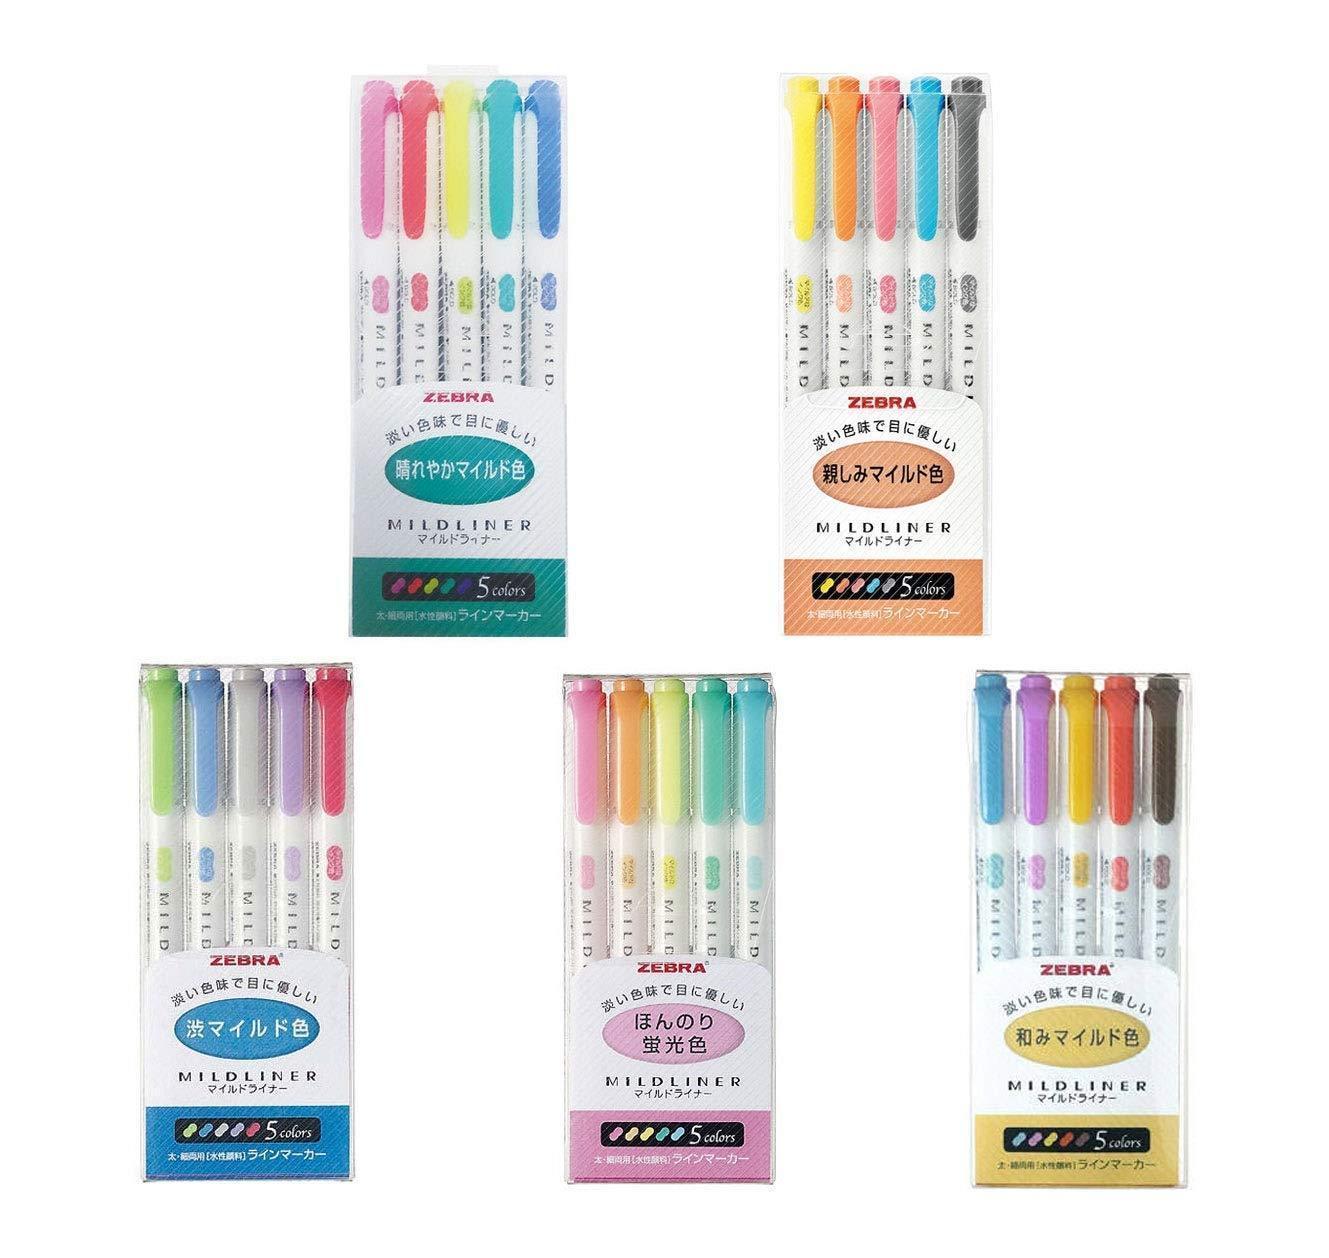 25 Colors Zebra 5 Type Japanese Mildliner Double-Sided Highlighter Pen Set Stationery